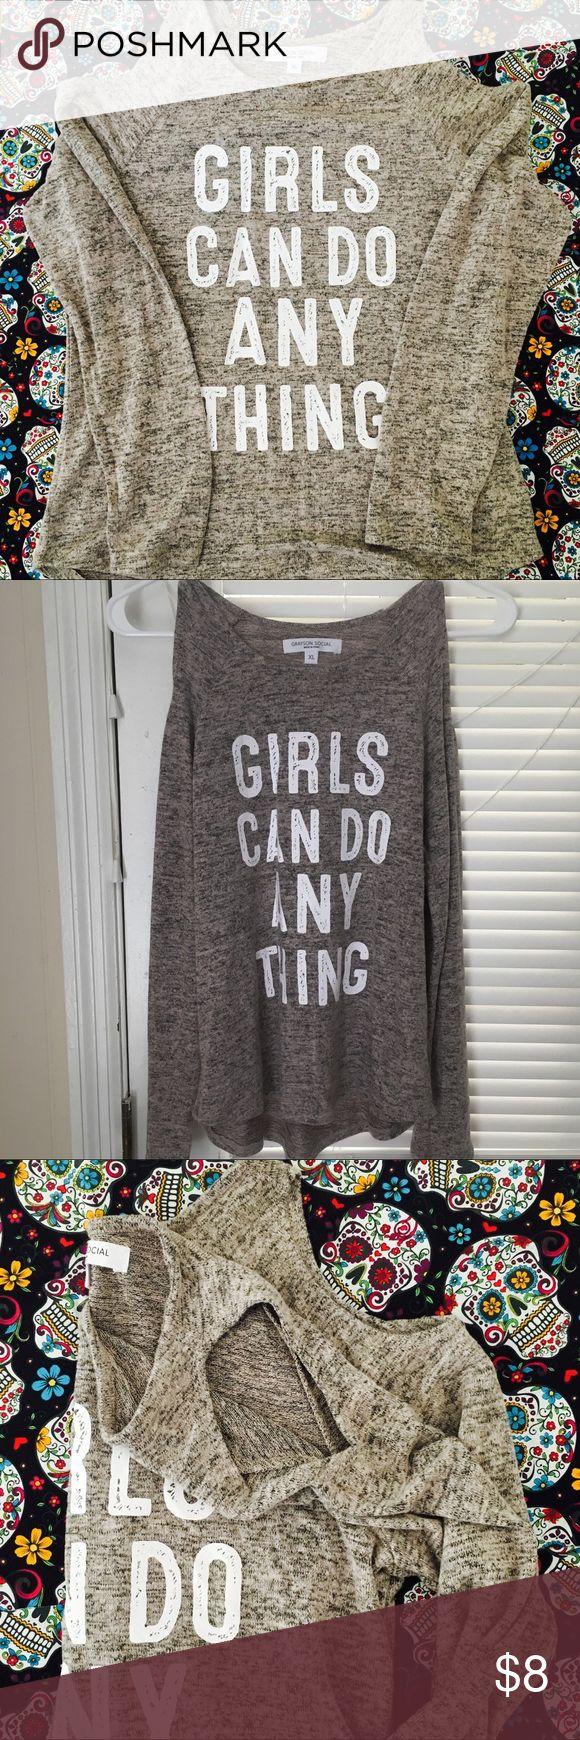 Girls' XL(16) Cold Shoulder Long Sleeve Sweater Softest fabric ever!!! NWOT never worn size XL girls art class Shirts & Tops Sweaters